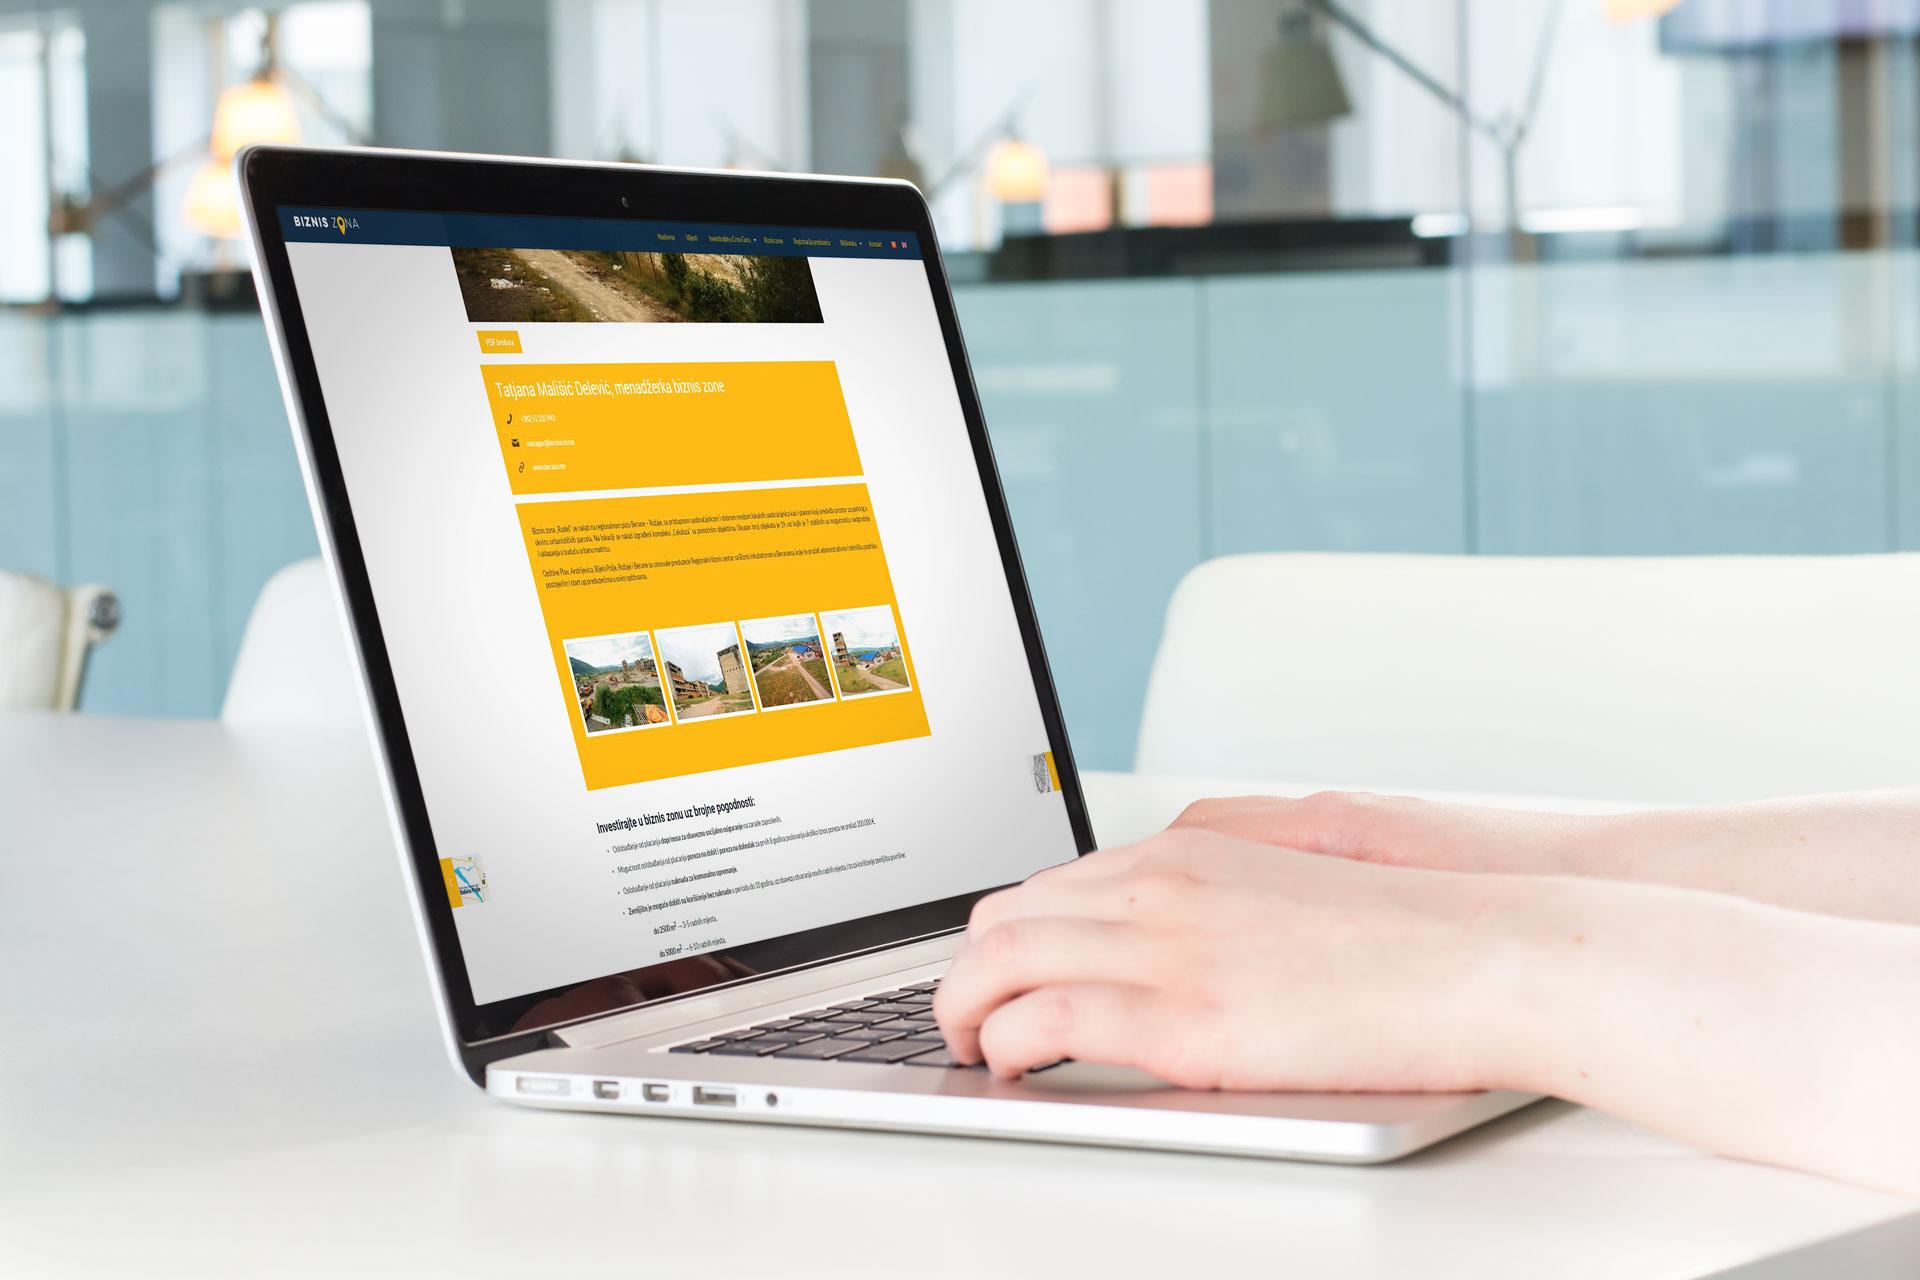 biznis zona web site template